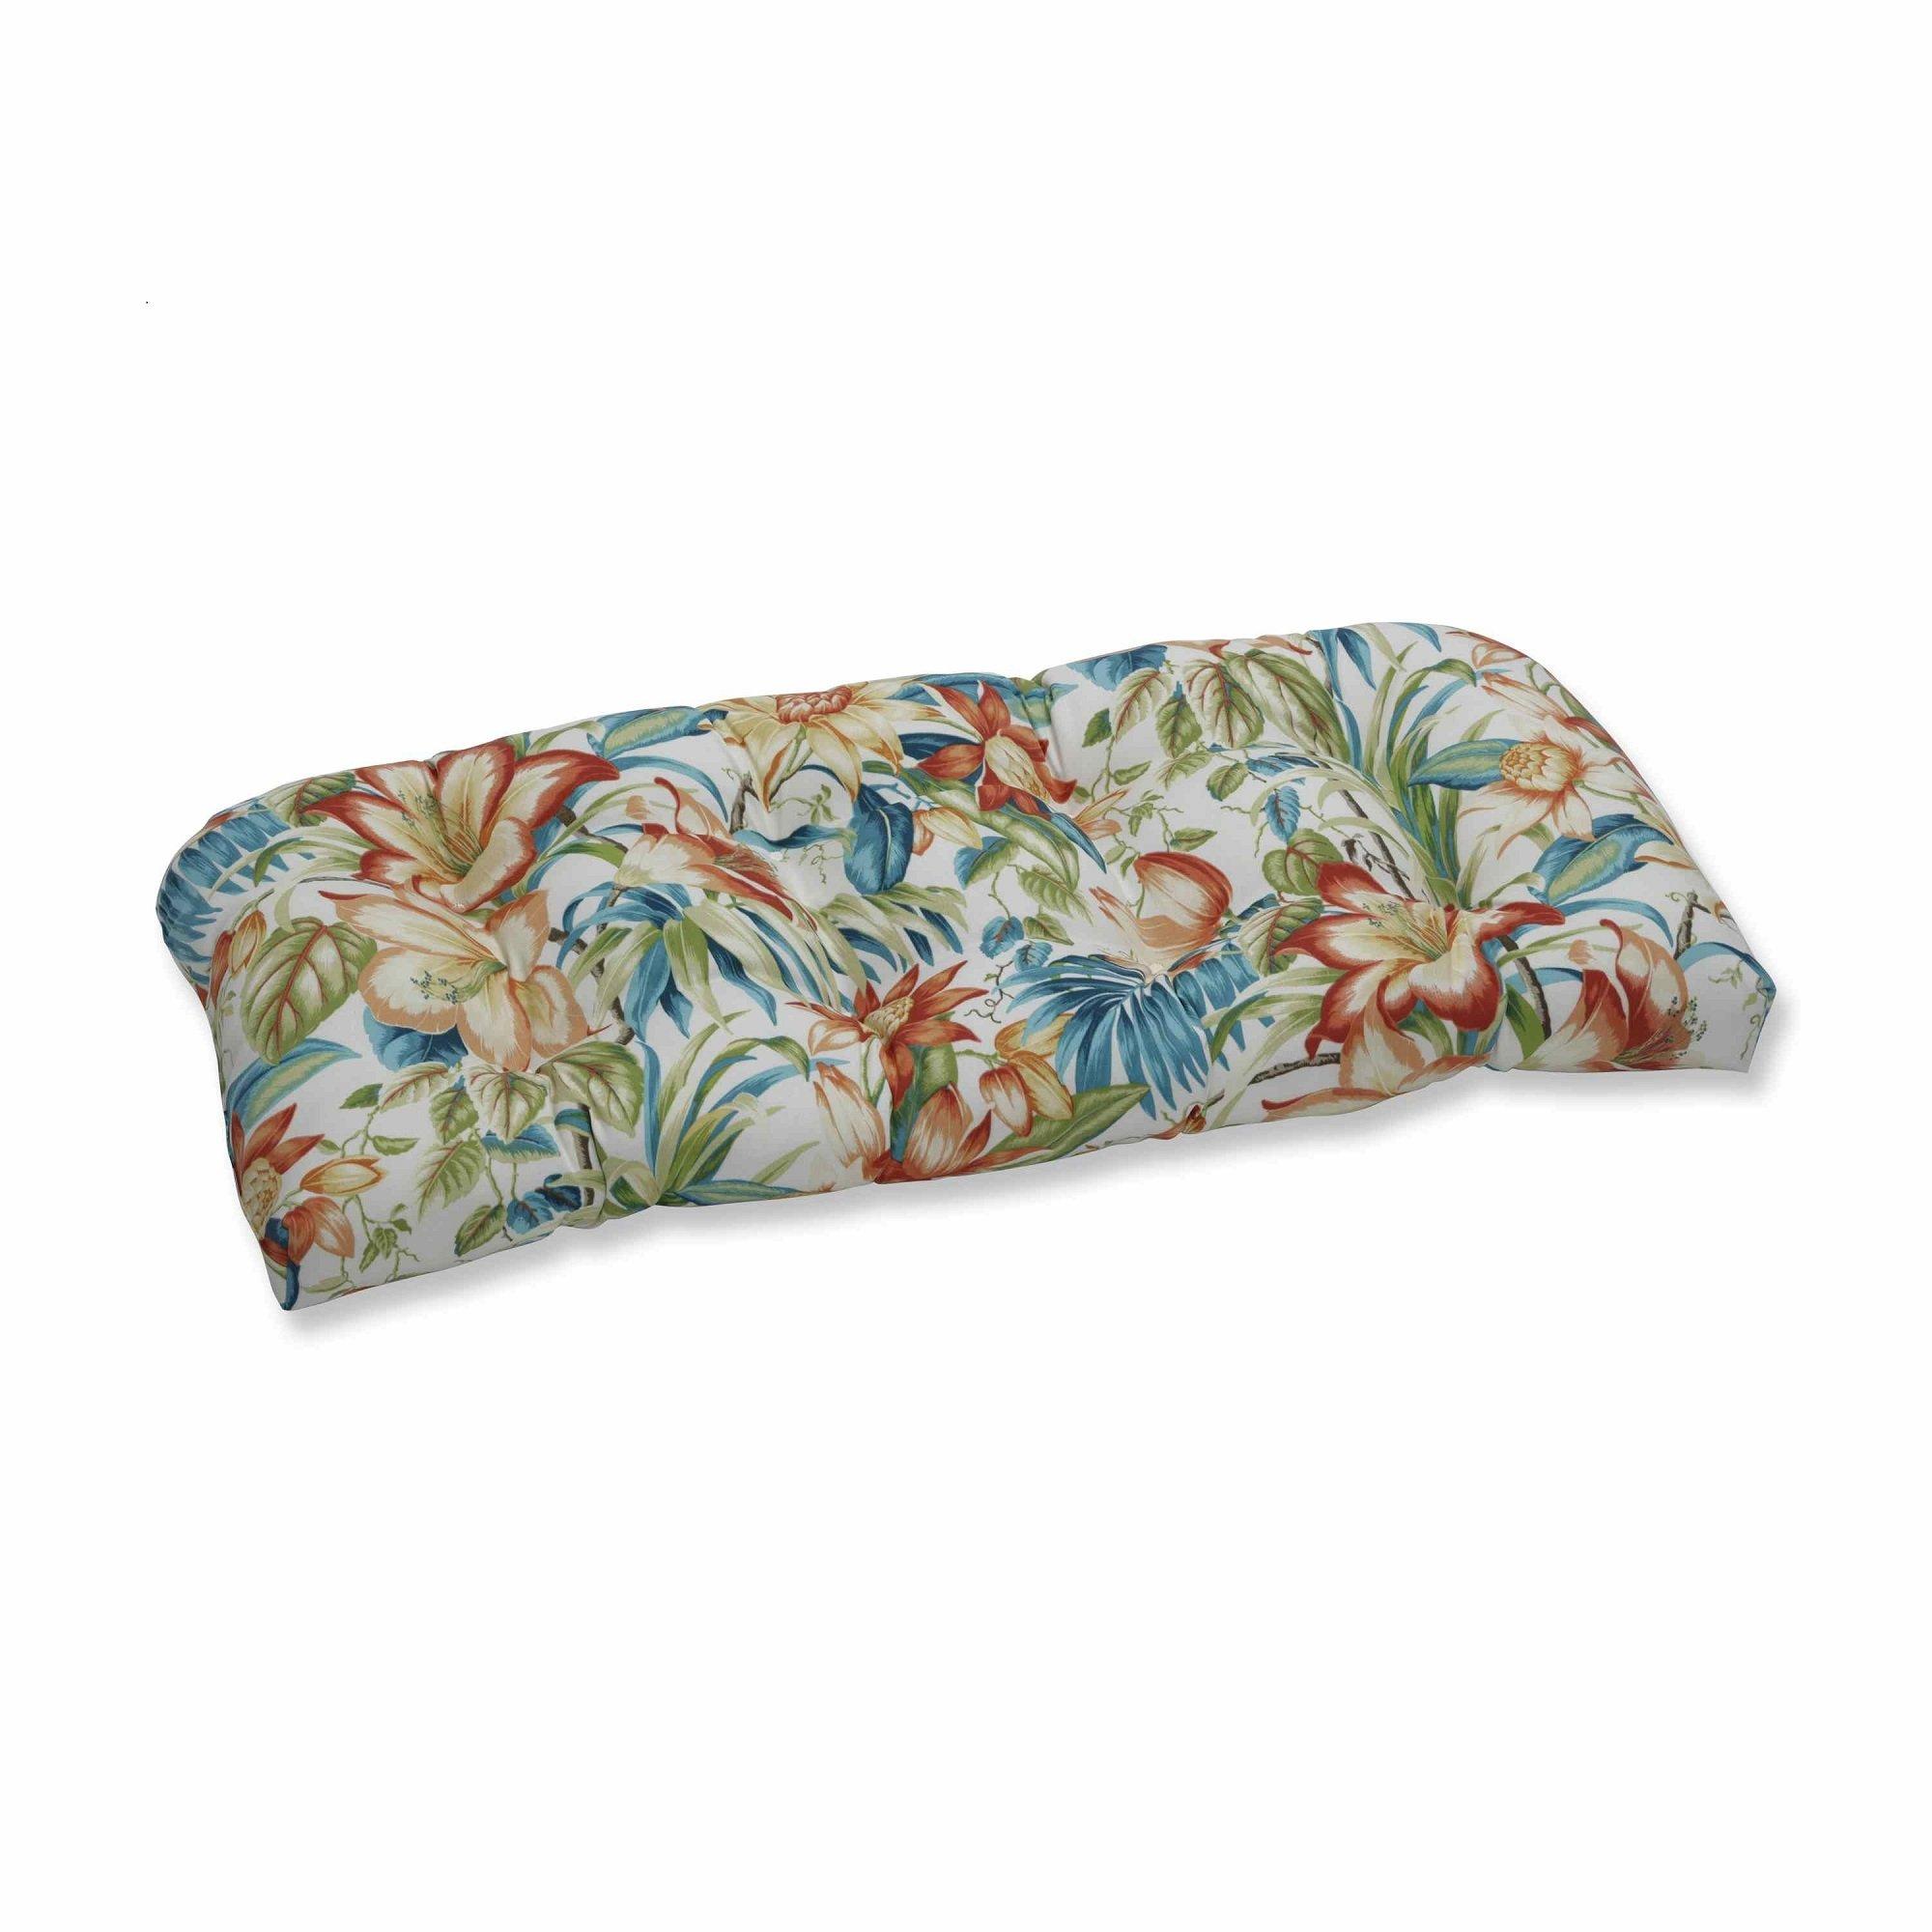 OKSLO Botanical glow tiger lily wicker loveseat cushion